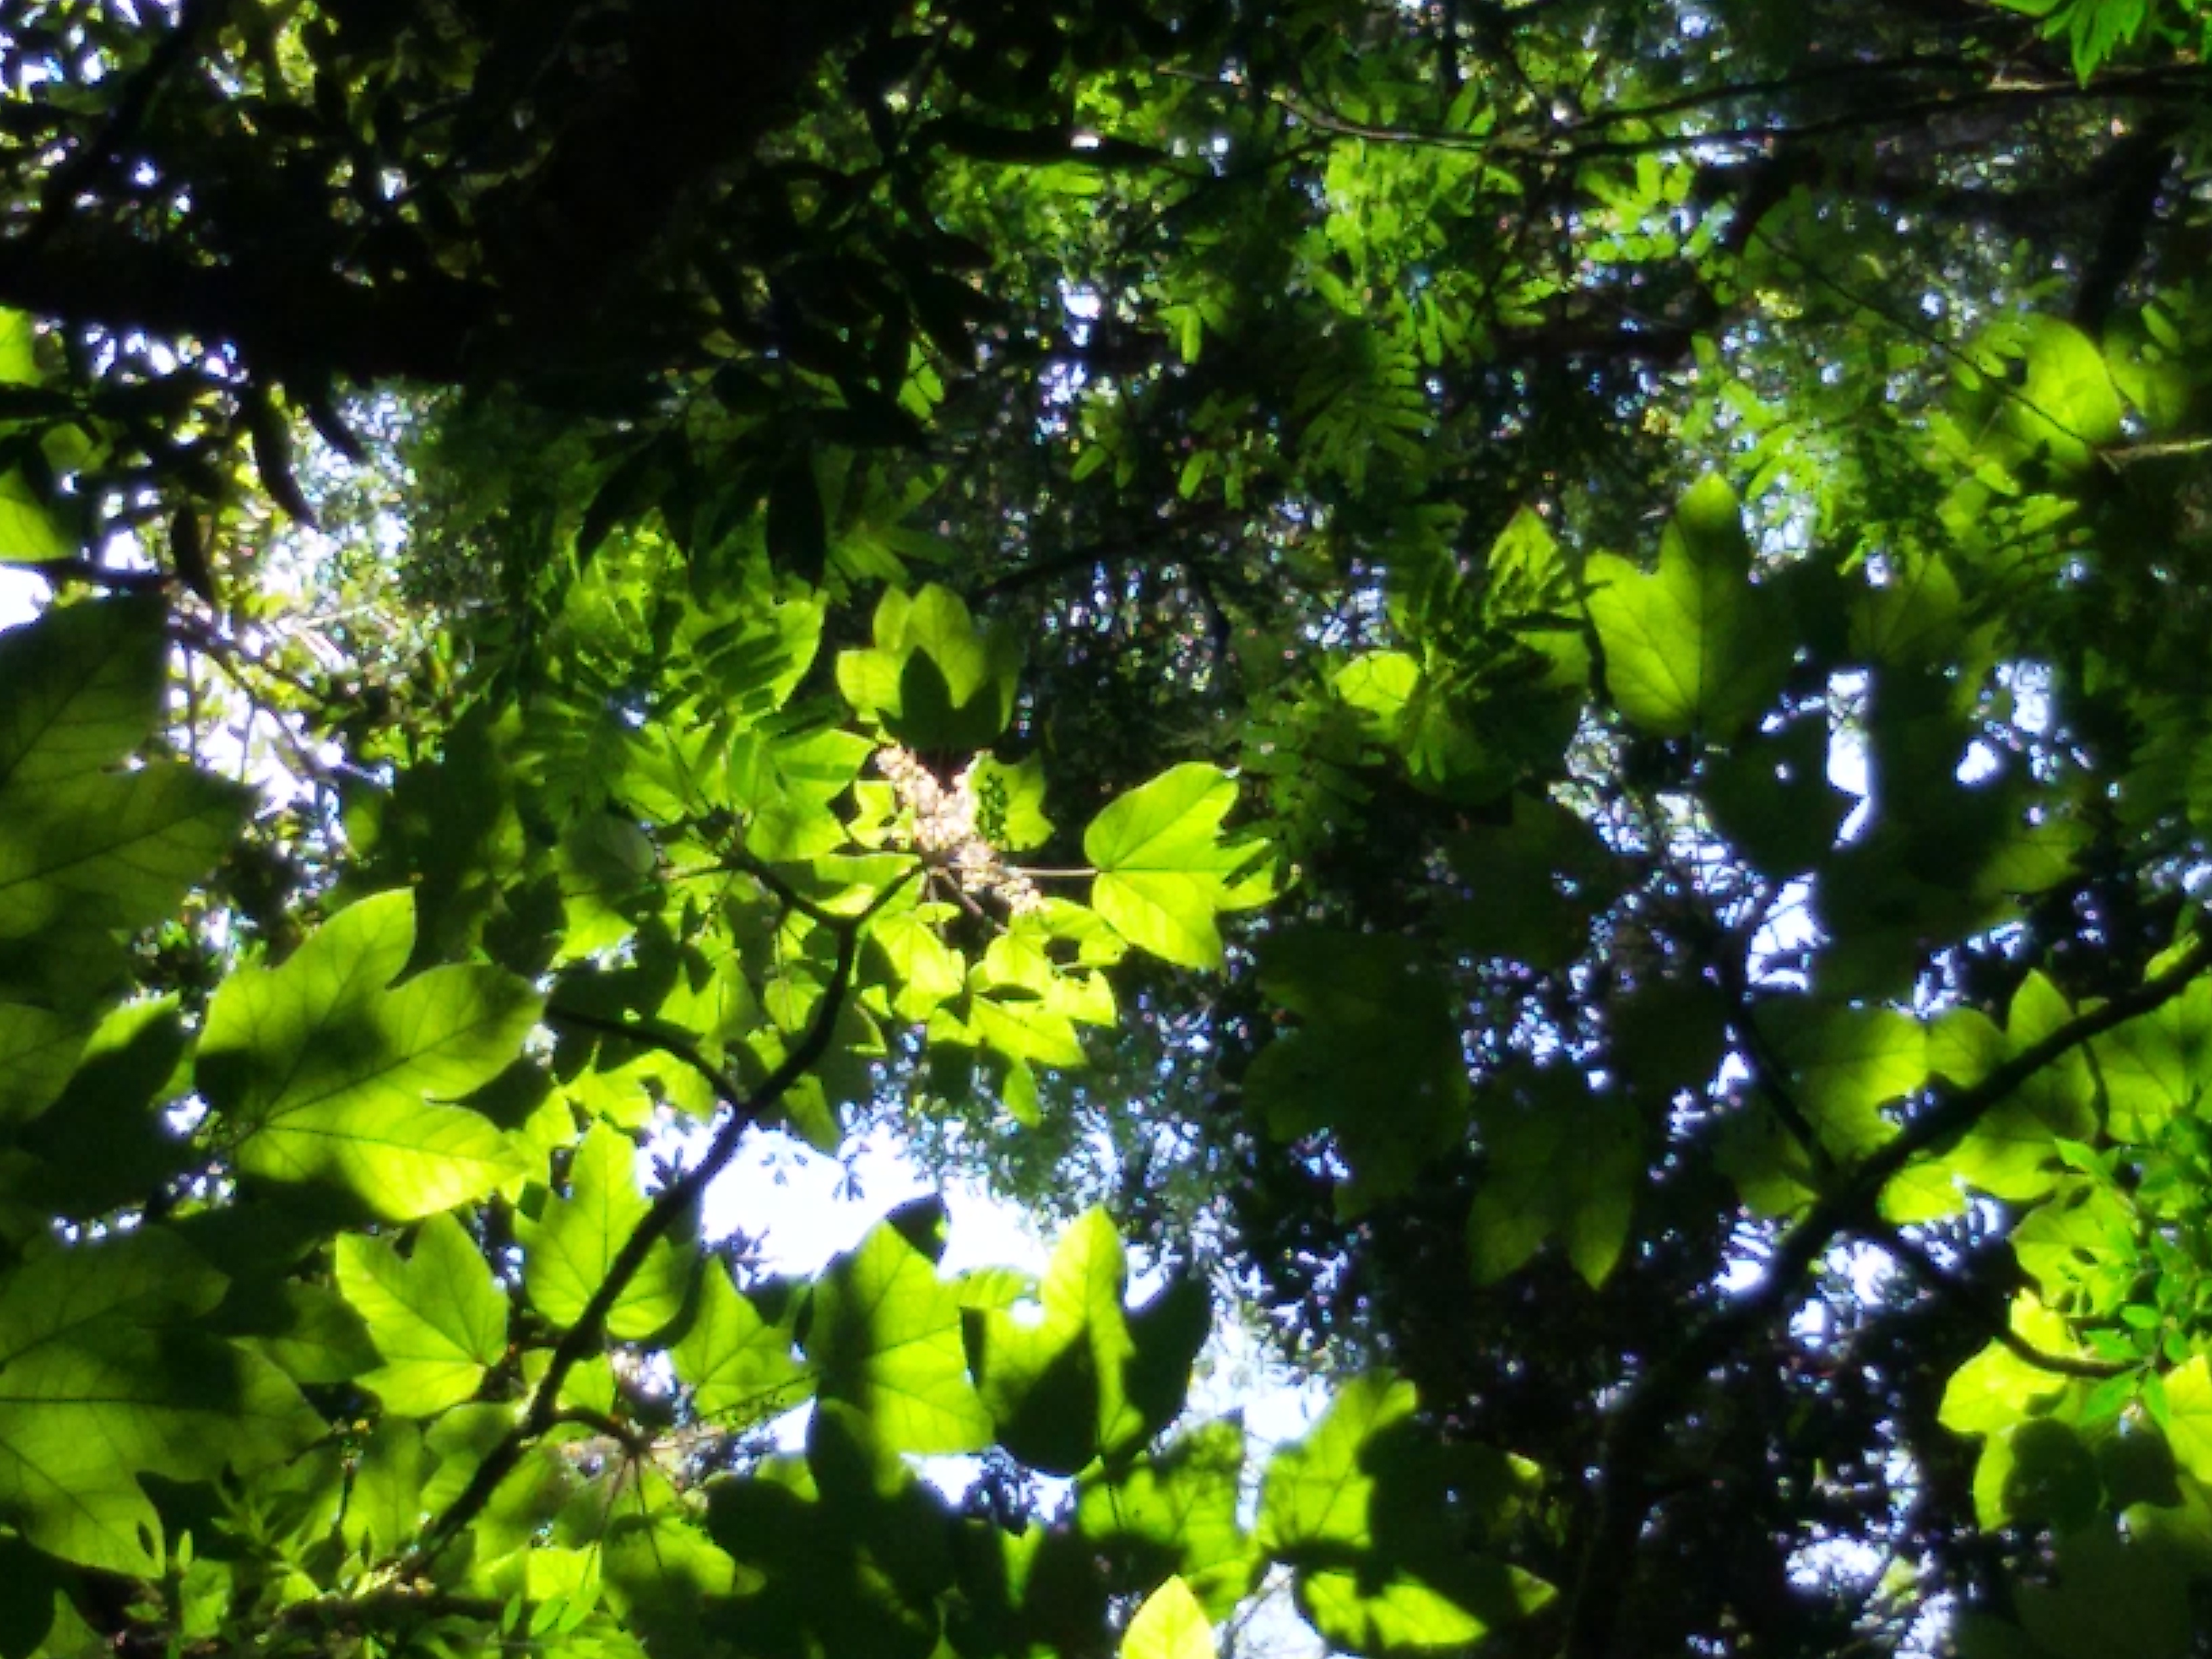 flor oreopanax 2 - Copia - Copia